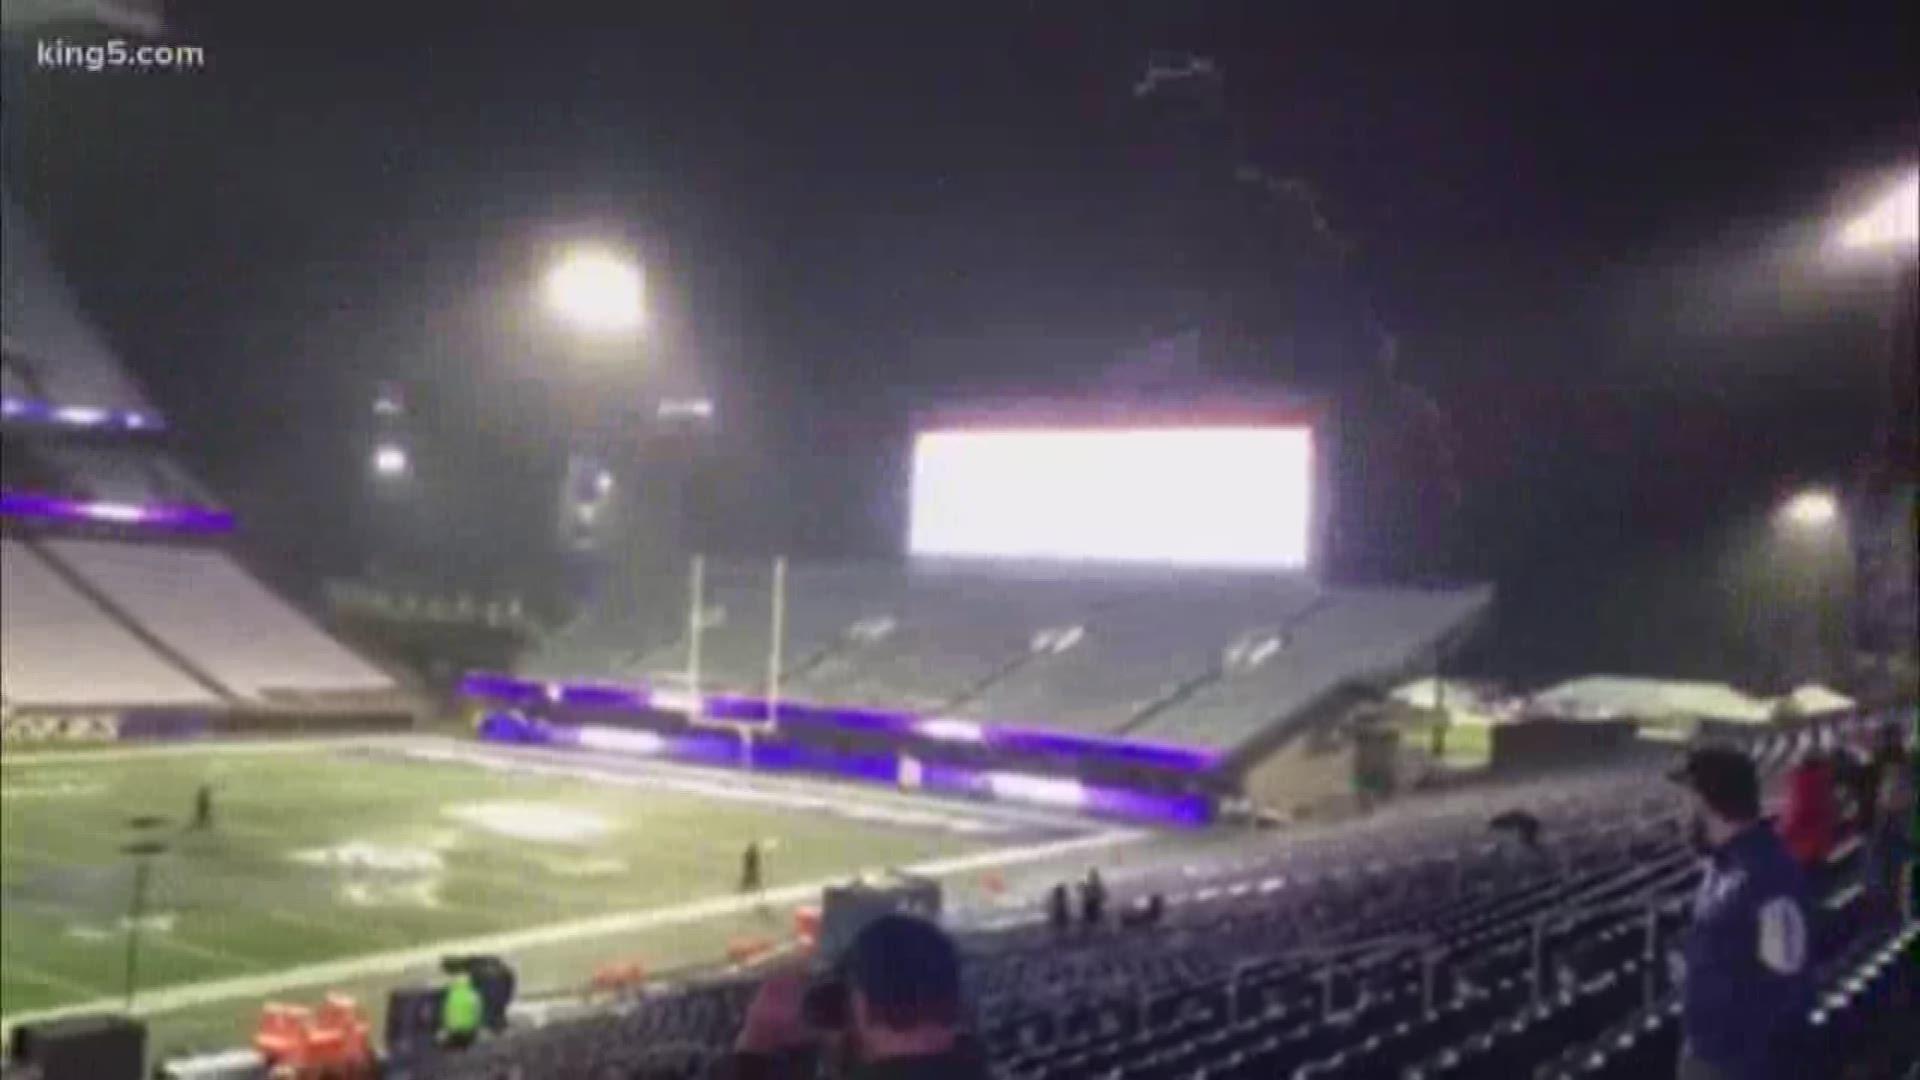 Thunder Lightning Rain Major Storm Moves Through Puget Sound King5 Com